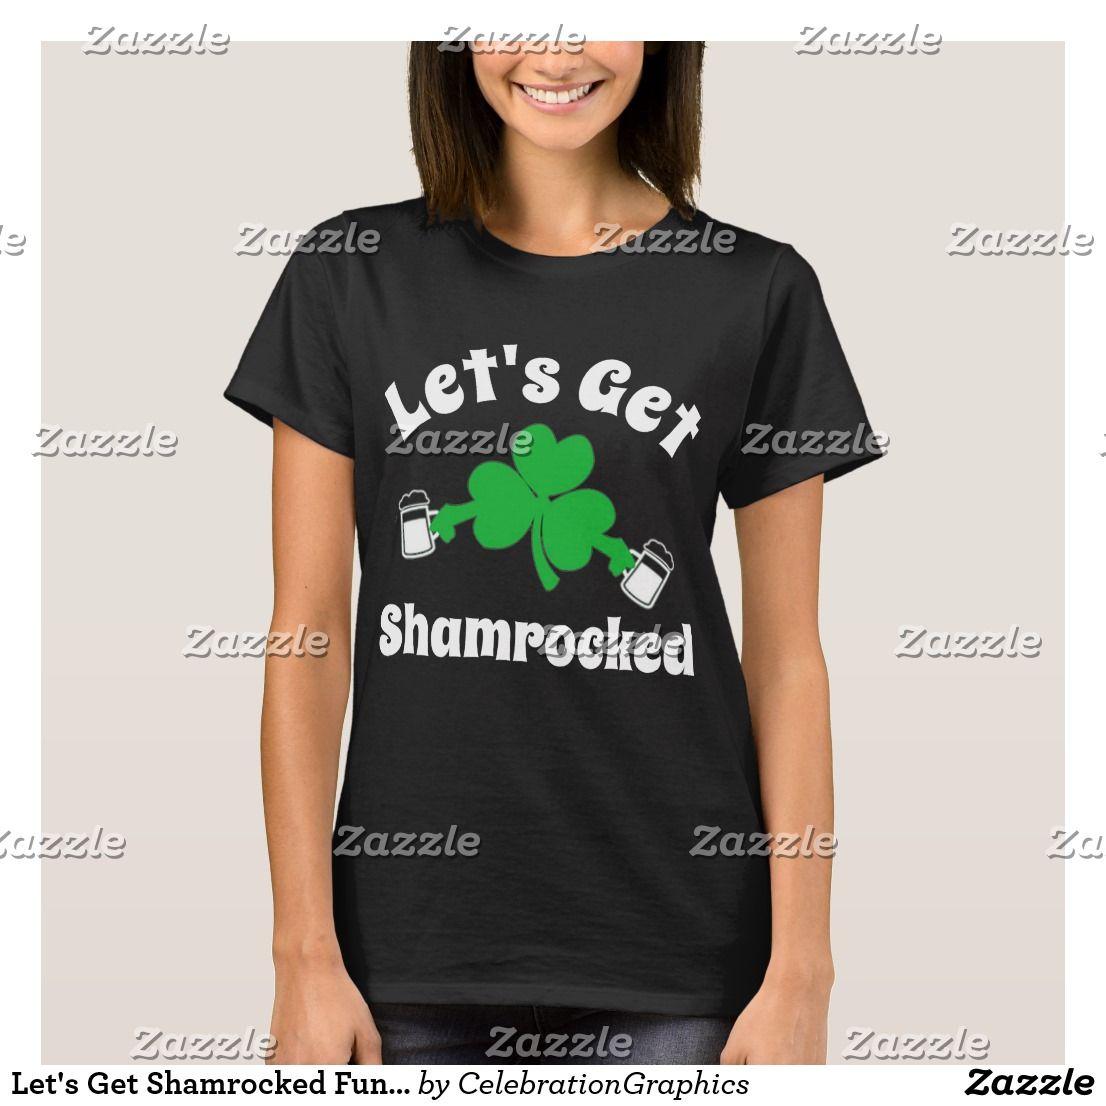 d18cc3875 Let's Get Shamrocked Funny St. Patrick's Day T-Shirt #stpatricksday  #stpatrick #stpaddysday #march #shamrocks #funny #humor #funnyshirts #cute  #party ...